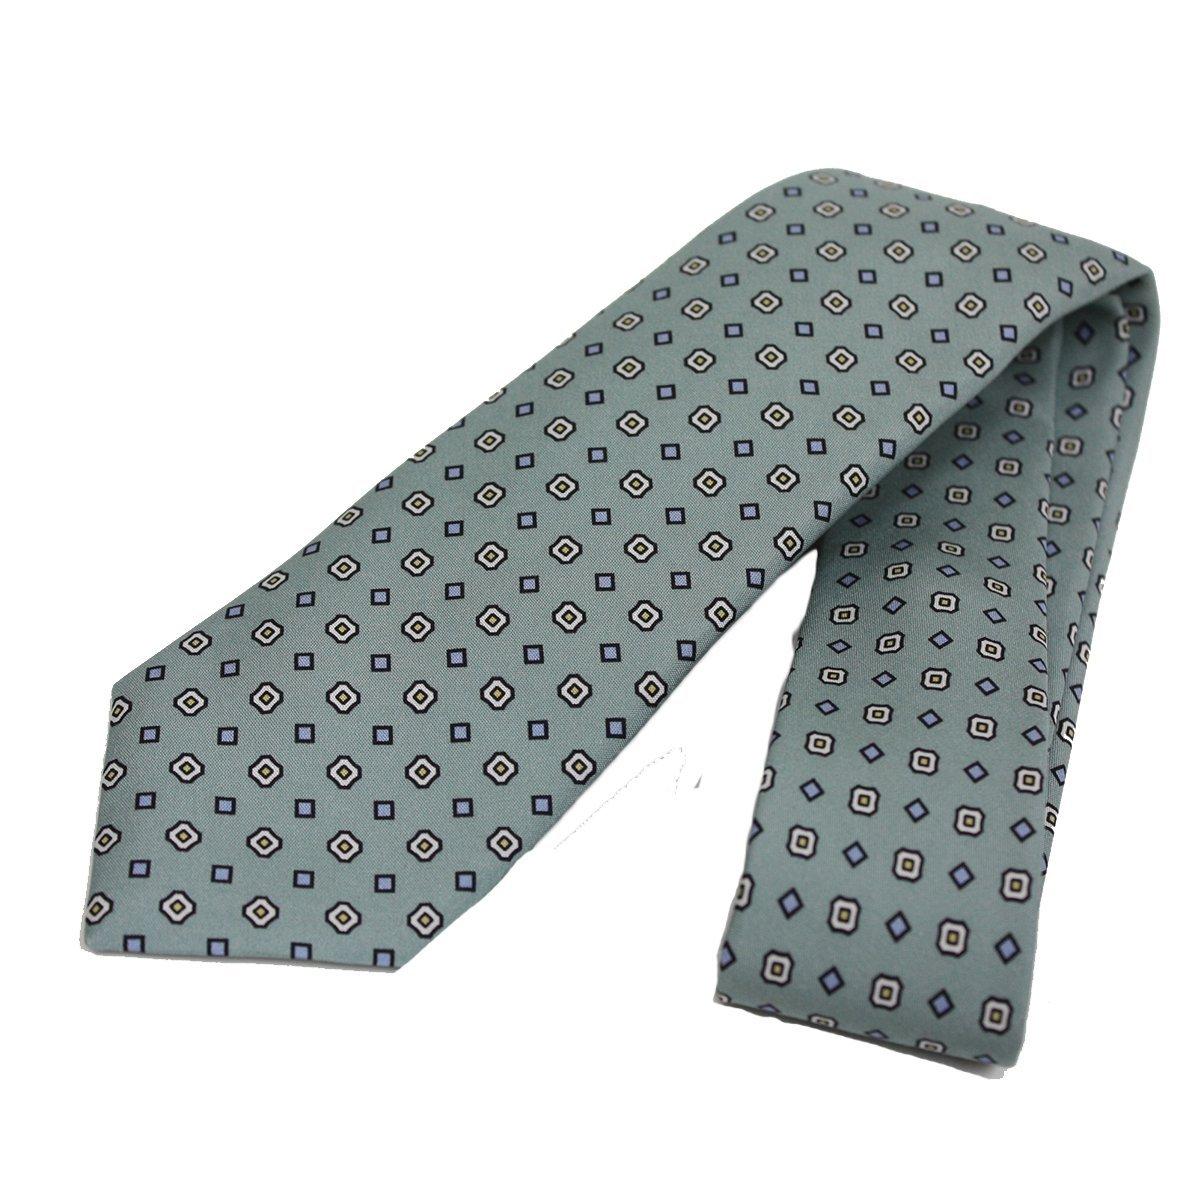 7ebd3dde9afb Amazon.com: Gucci Patterned Sea Foam Green Woven Silk Tie 368200: Clothing